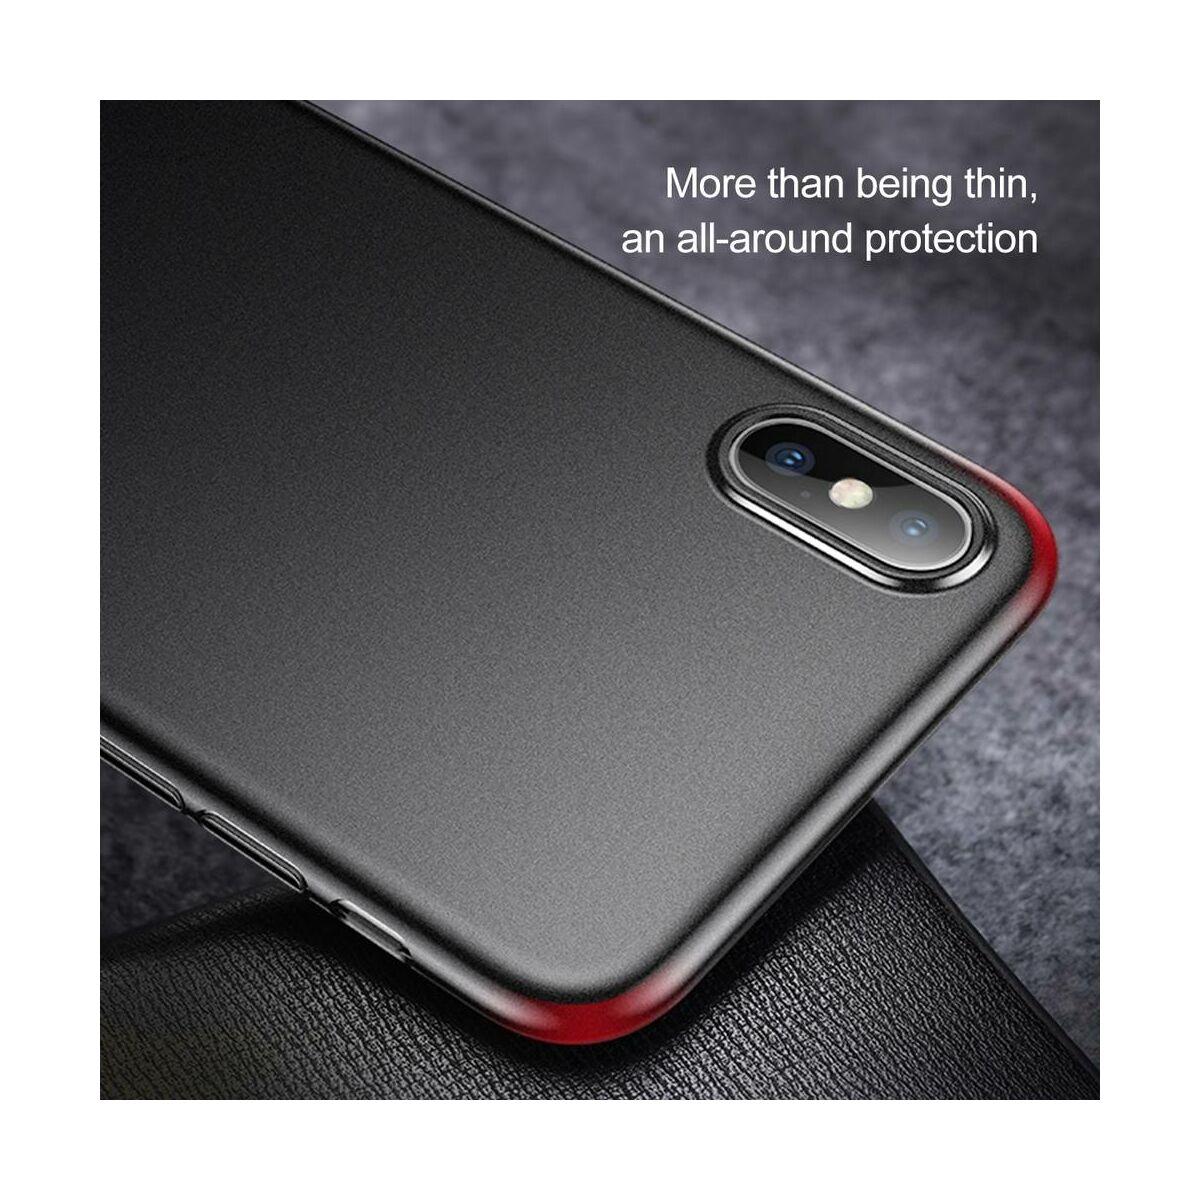 Baseus iPhone XS tok, Wing, átlátszó fekete (WIAPIPH58-E01)